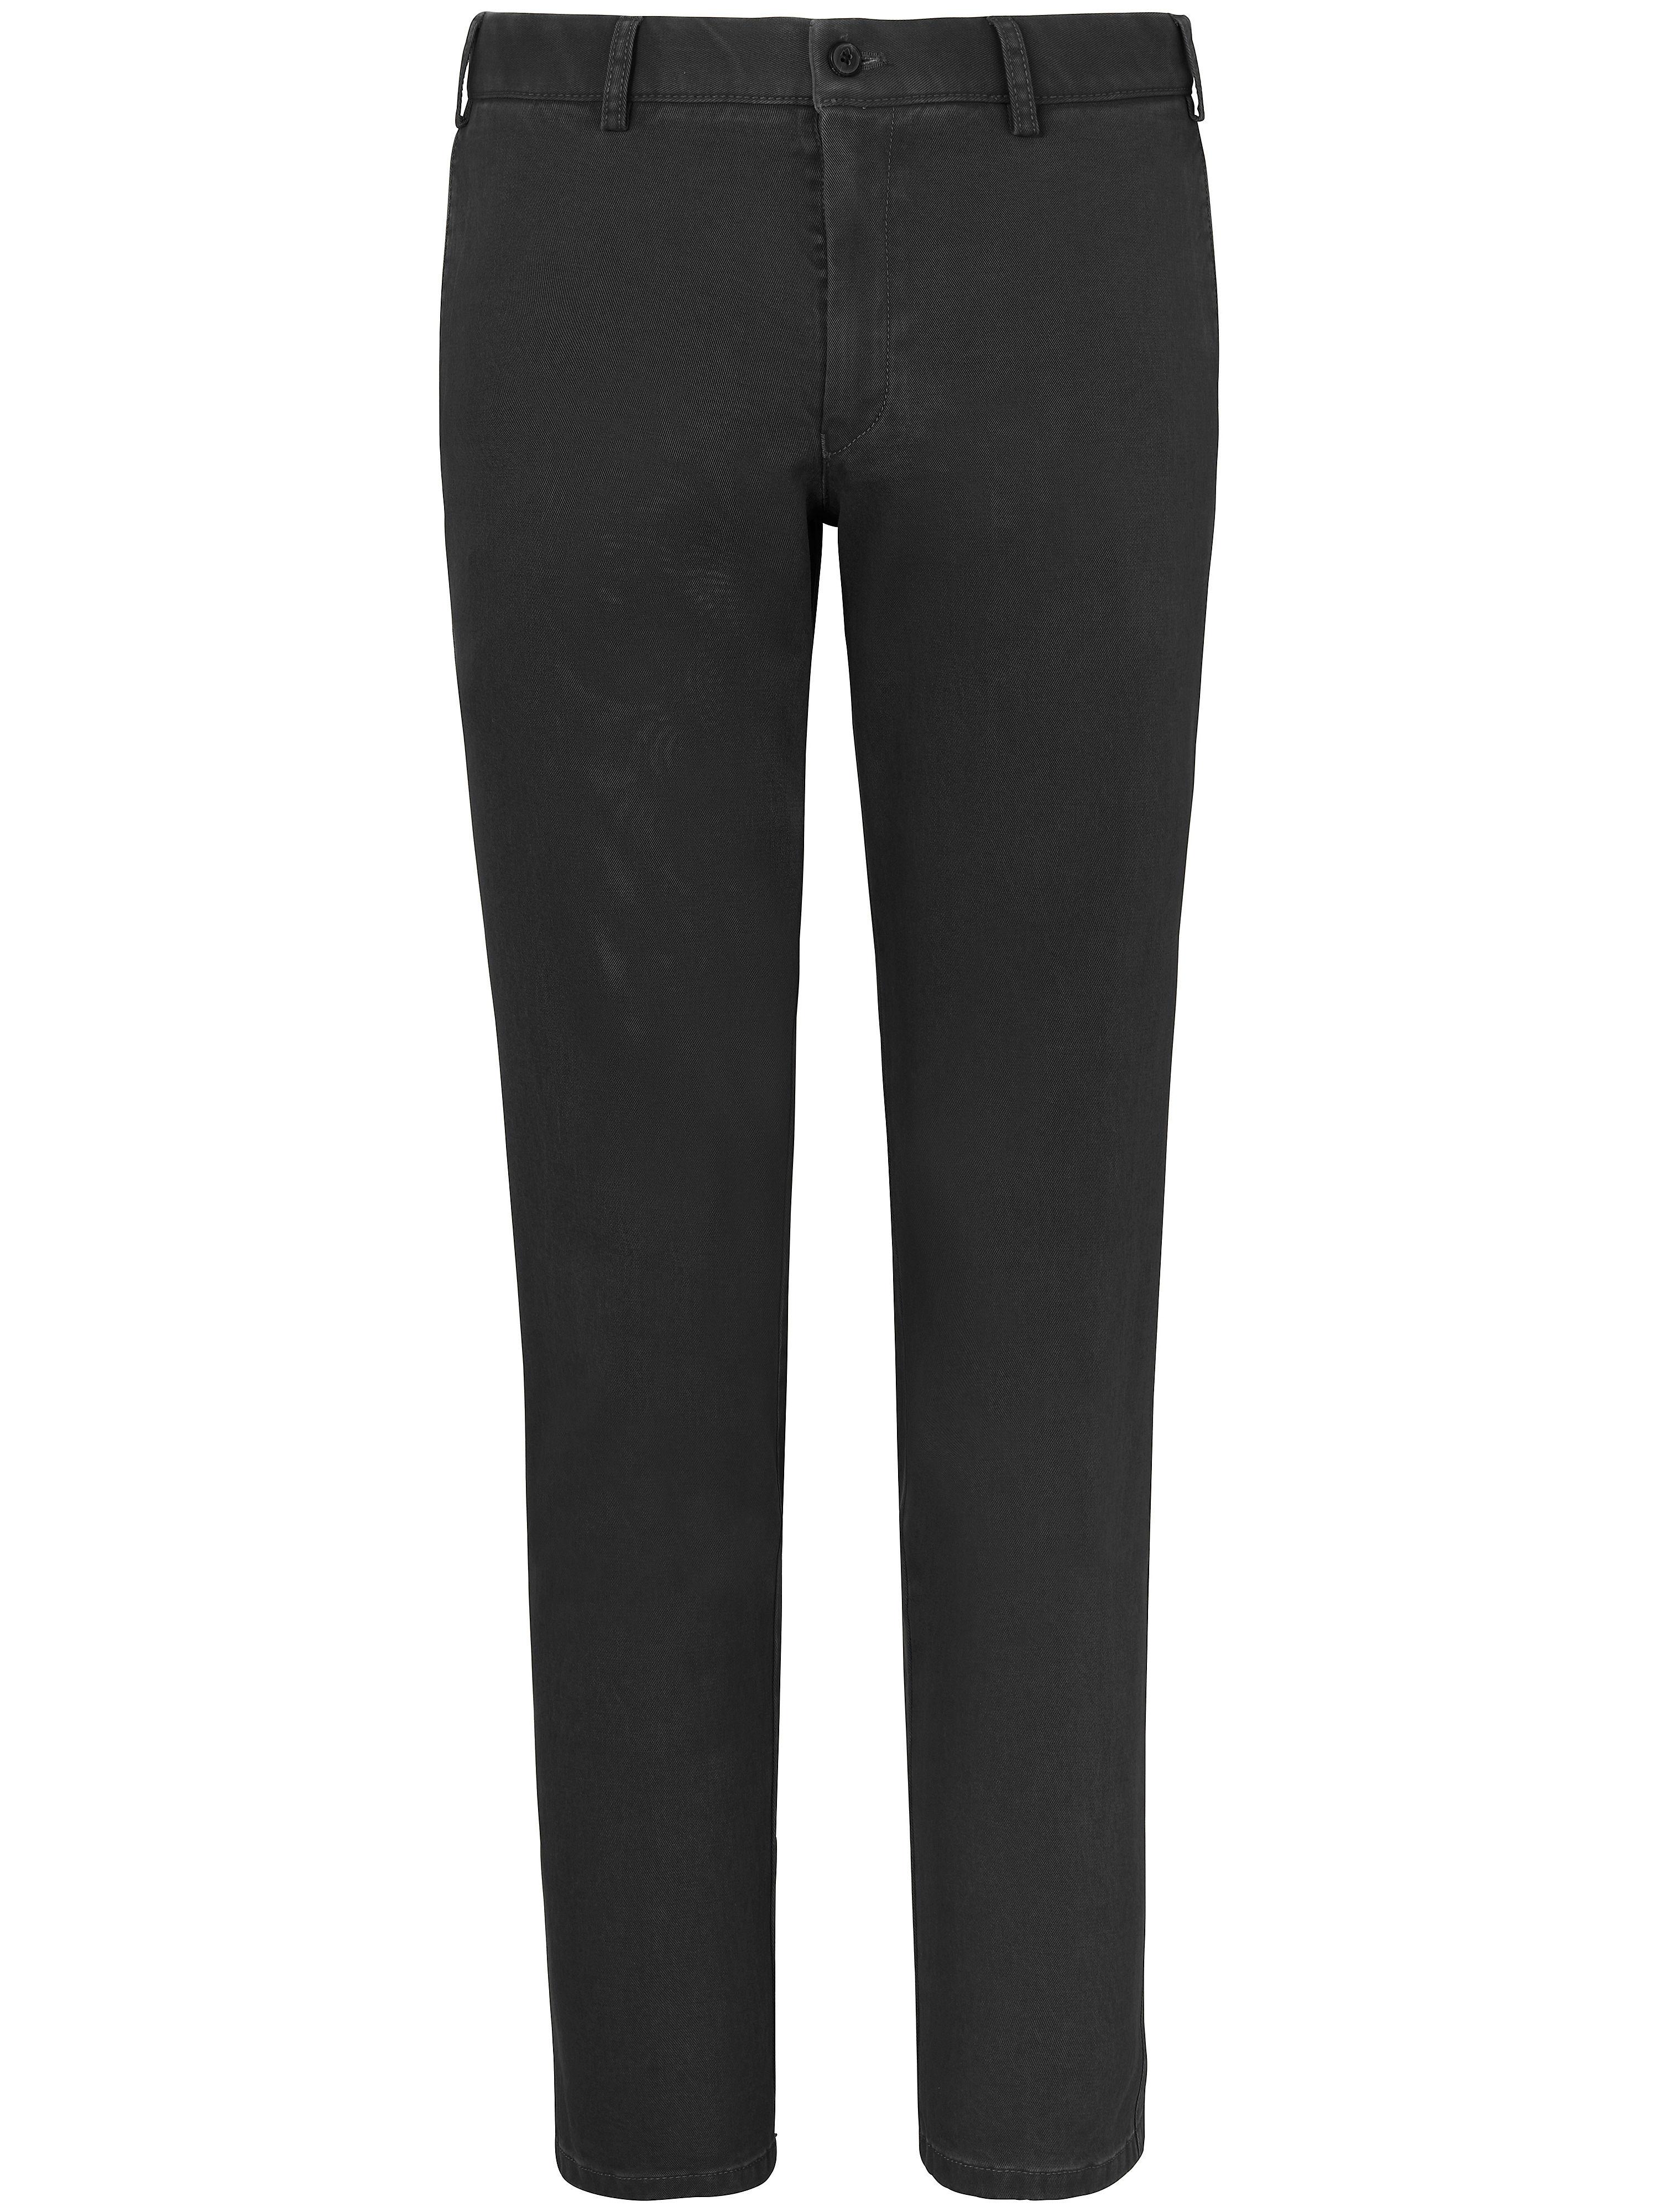 Le pantalon  HILTL gris